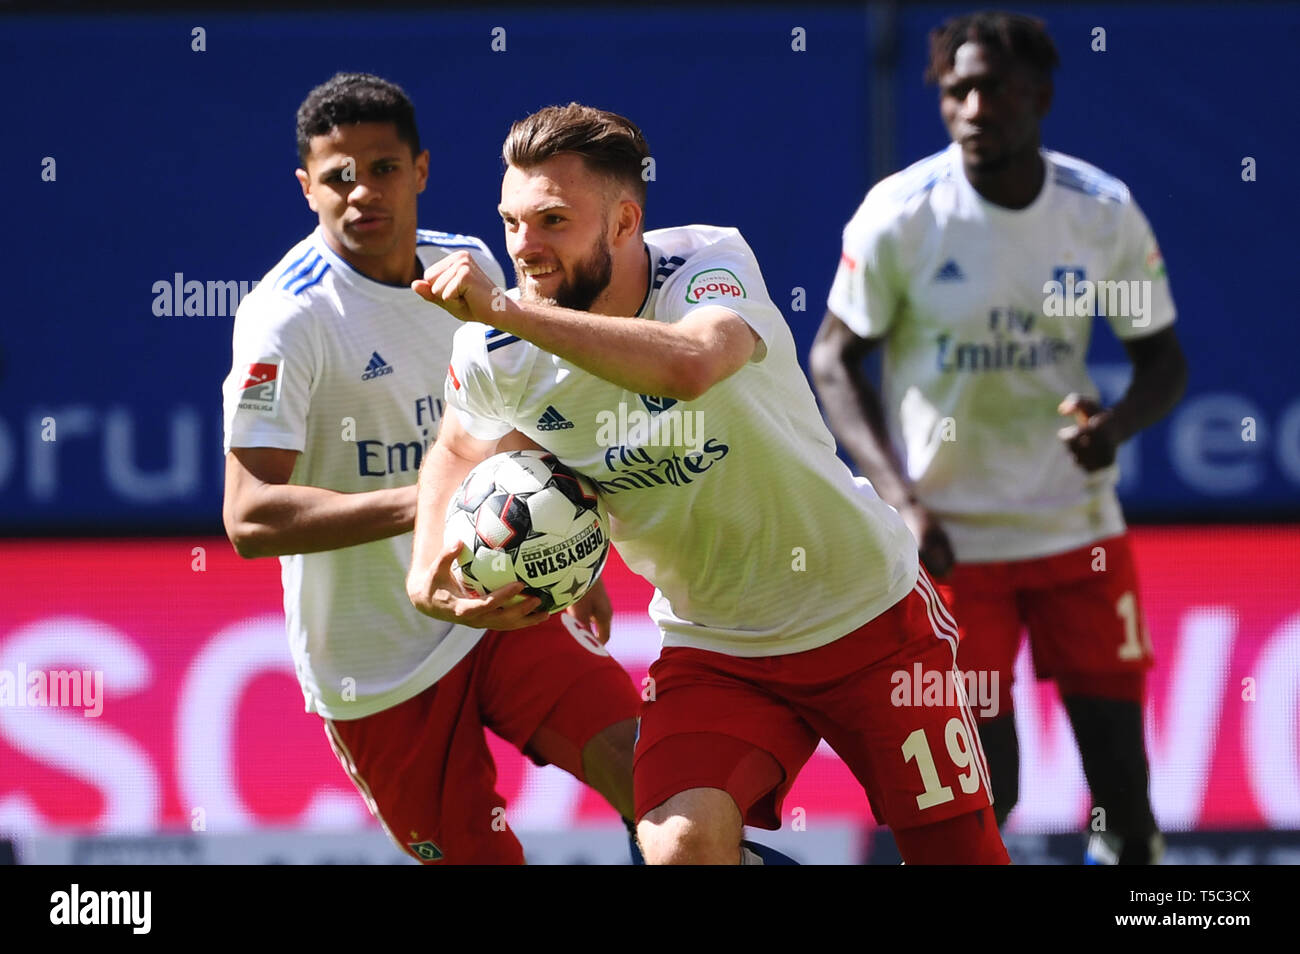 HAMBURG, GERMANY - APRIL 20: Manuel Wintzheimer of Hamburg celebrates after scoring his team's first goal during the second Bundesliga match between H - Stock Image